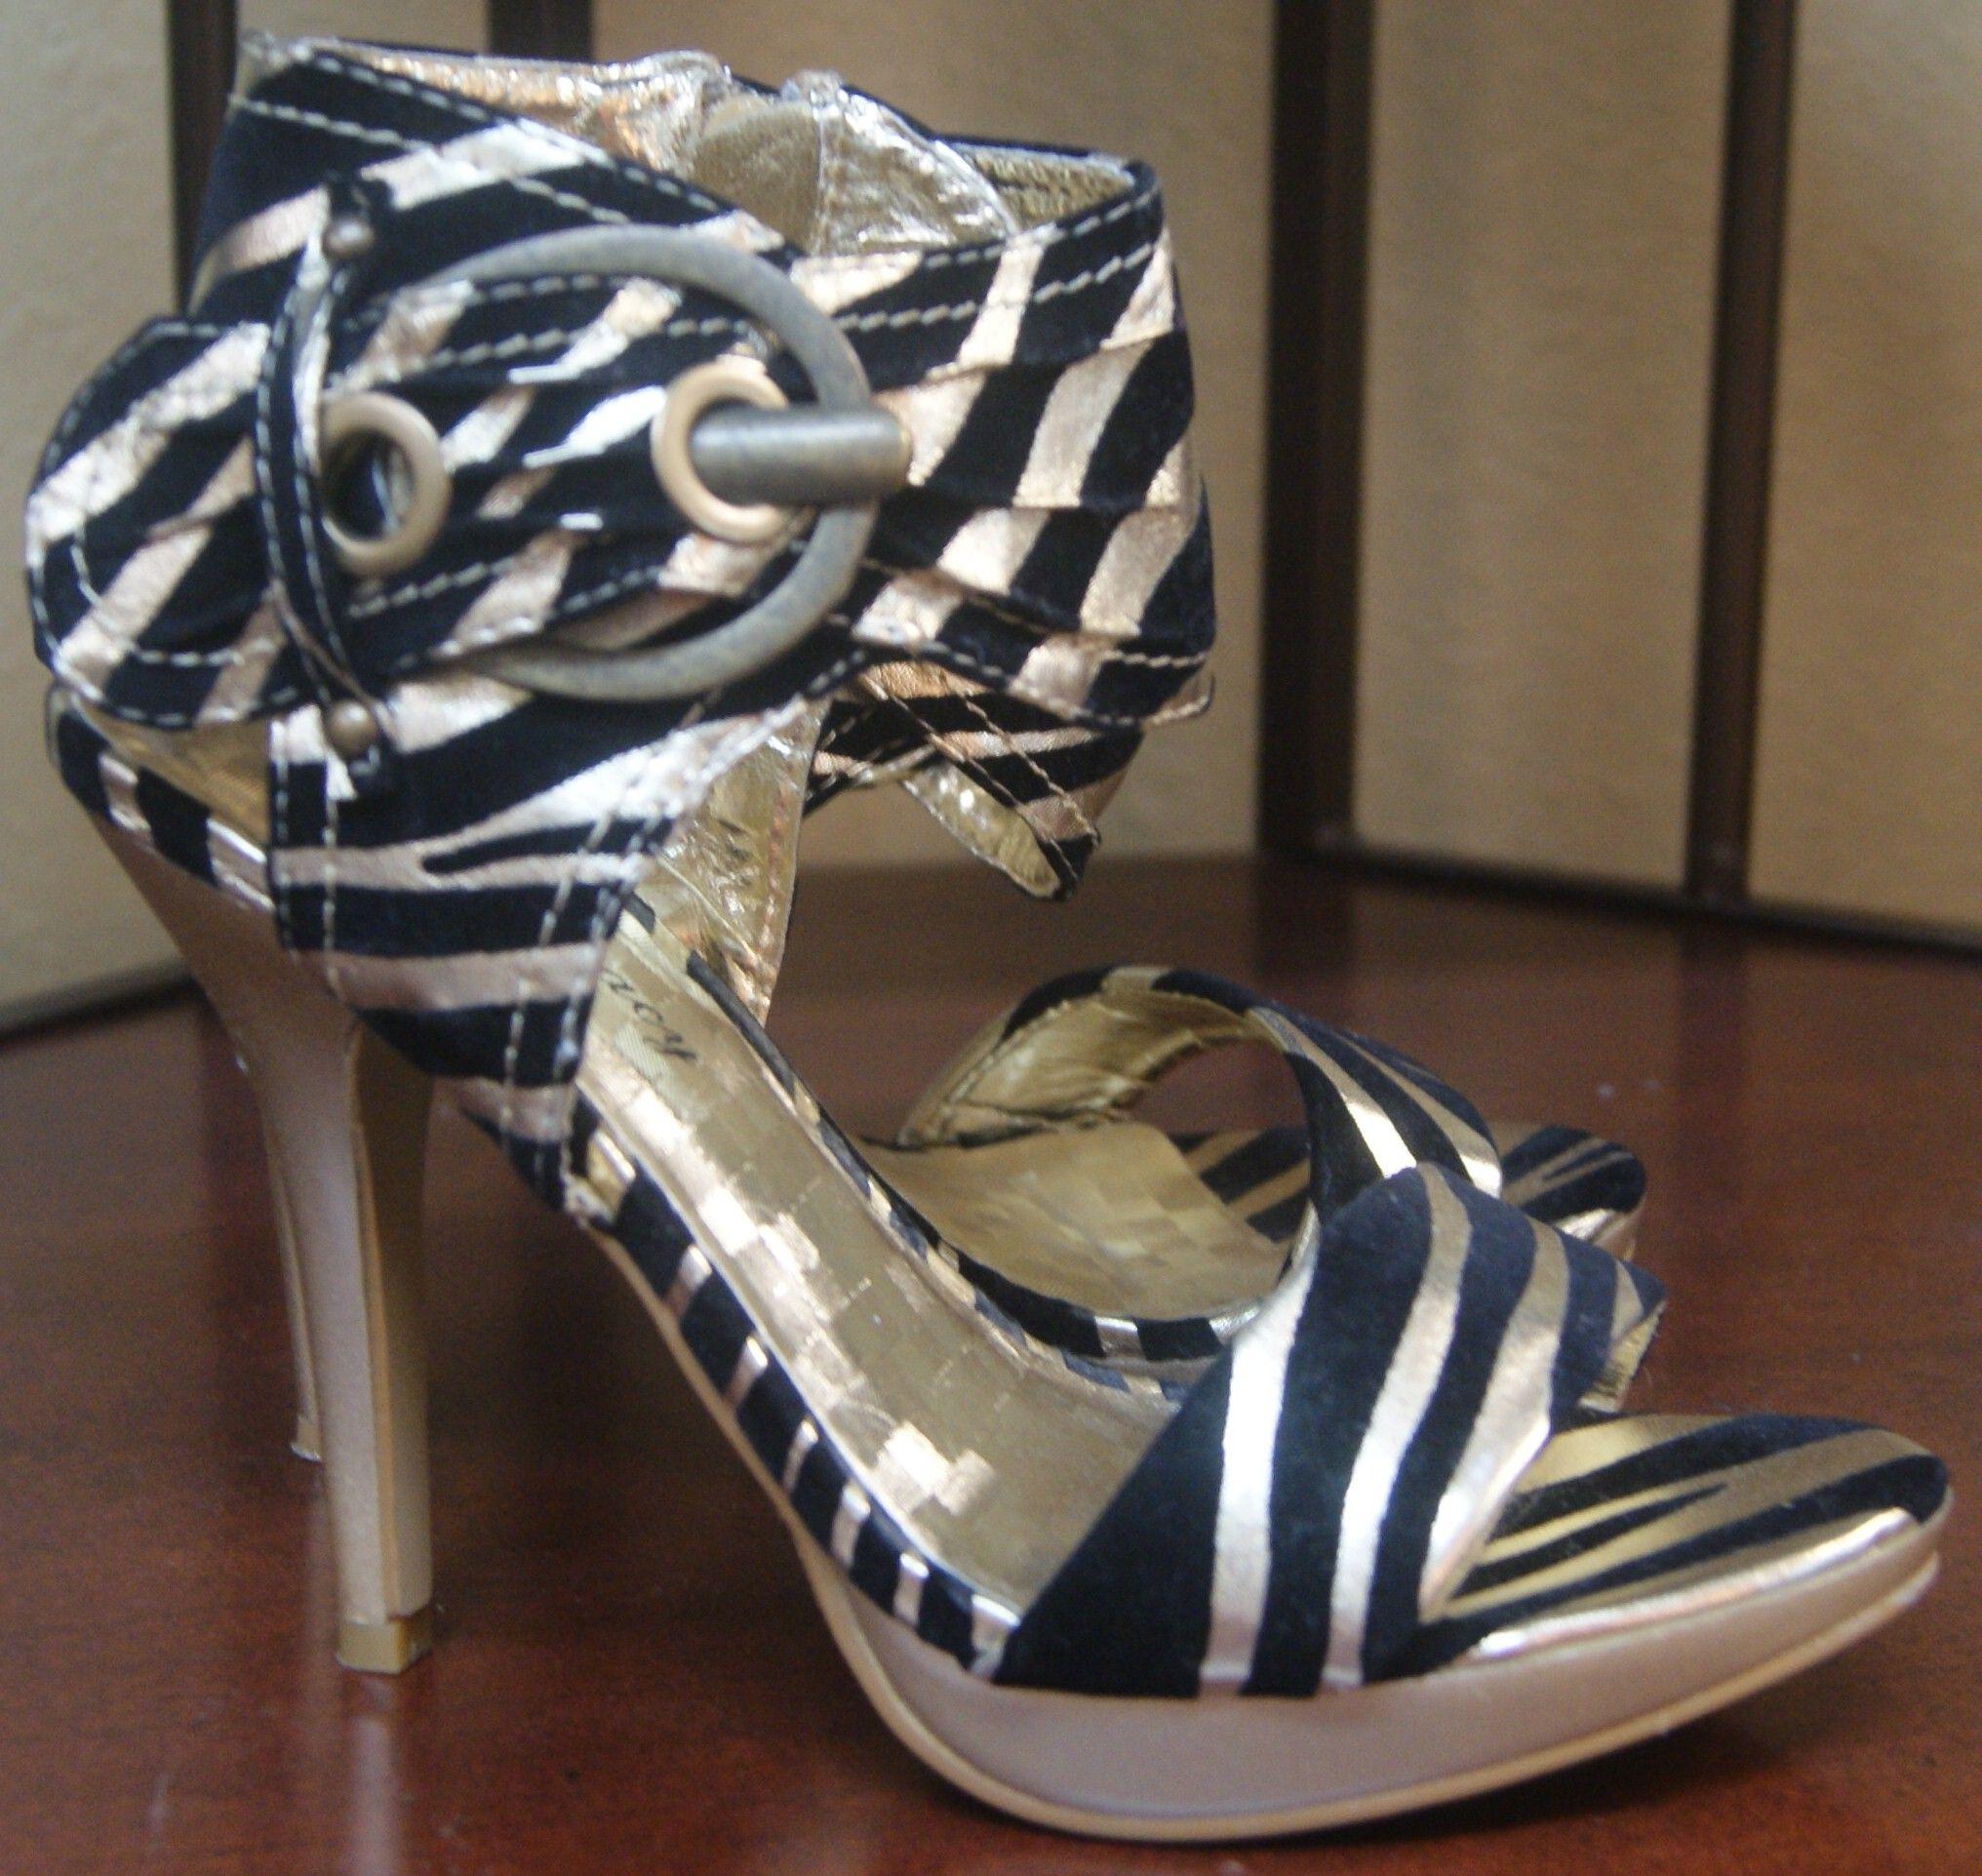 b53eb7e61a5 Gold & Black Zebra Print Stiletto Heels by Delicacy Size: 6 $35.00 ...